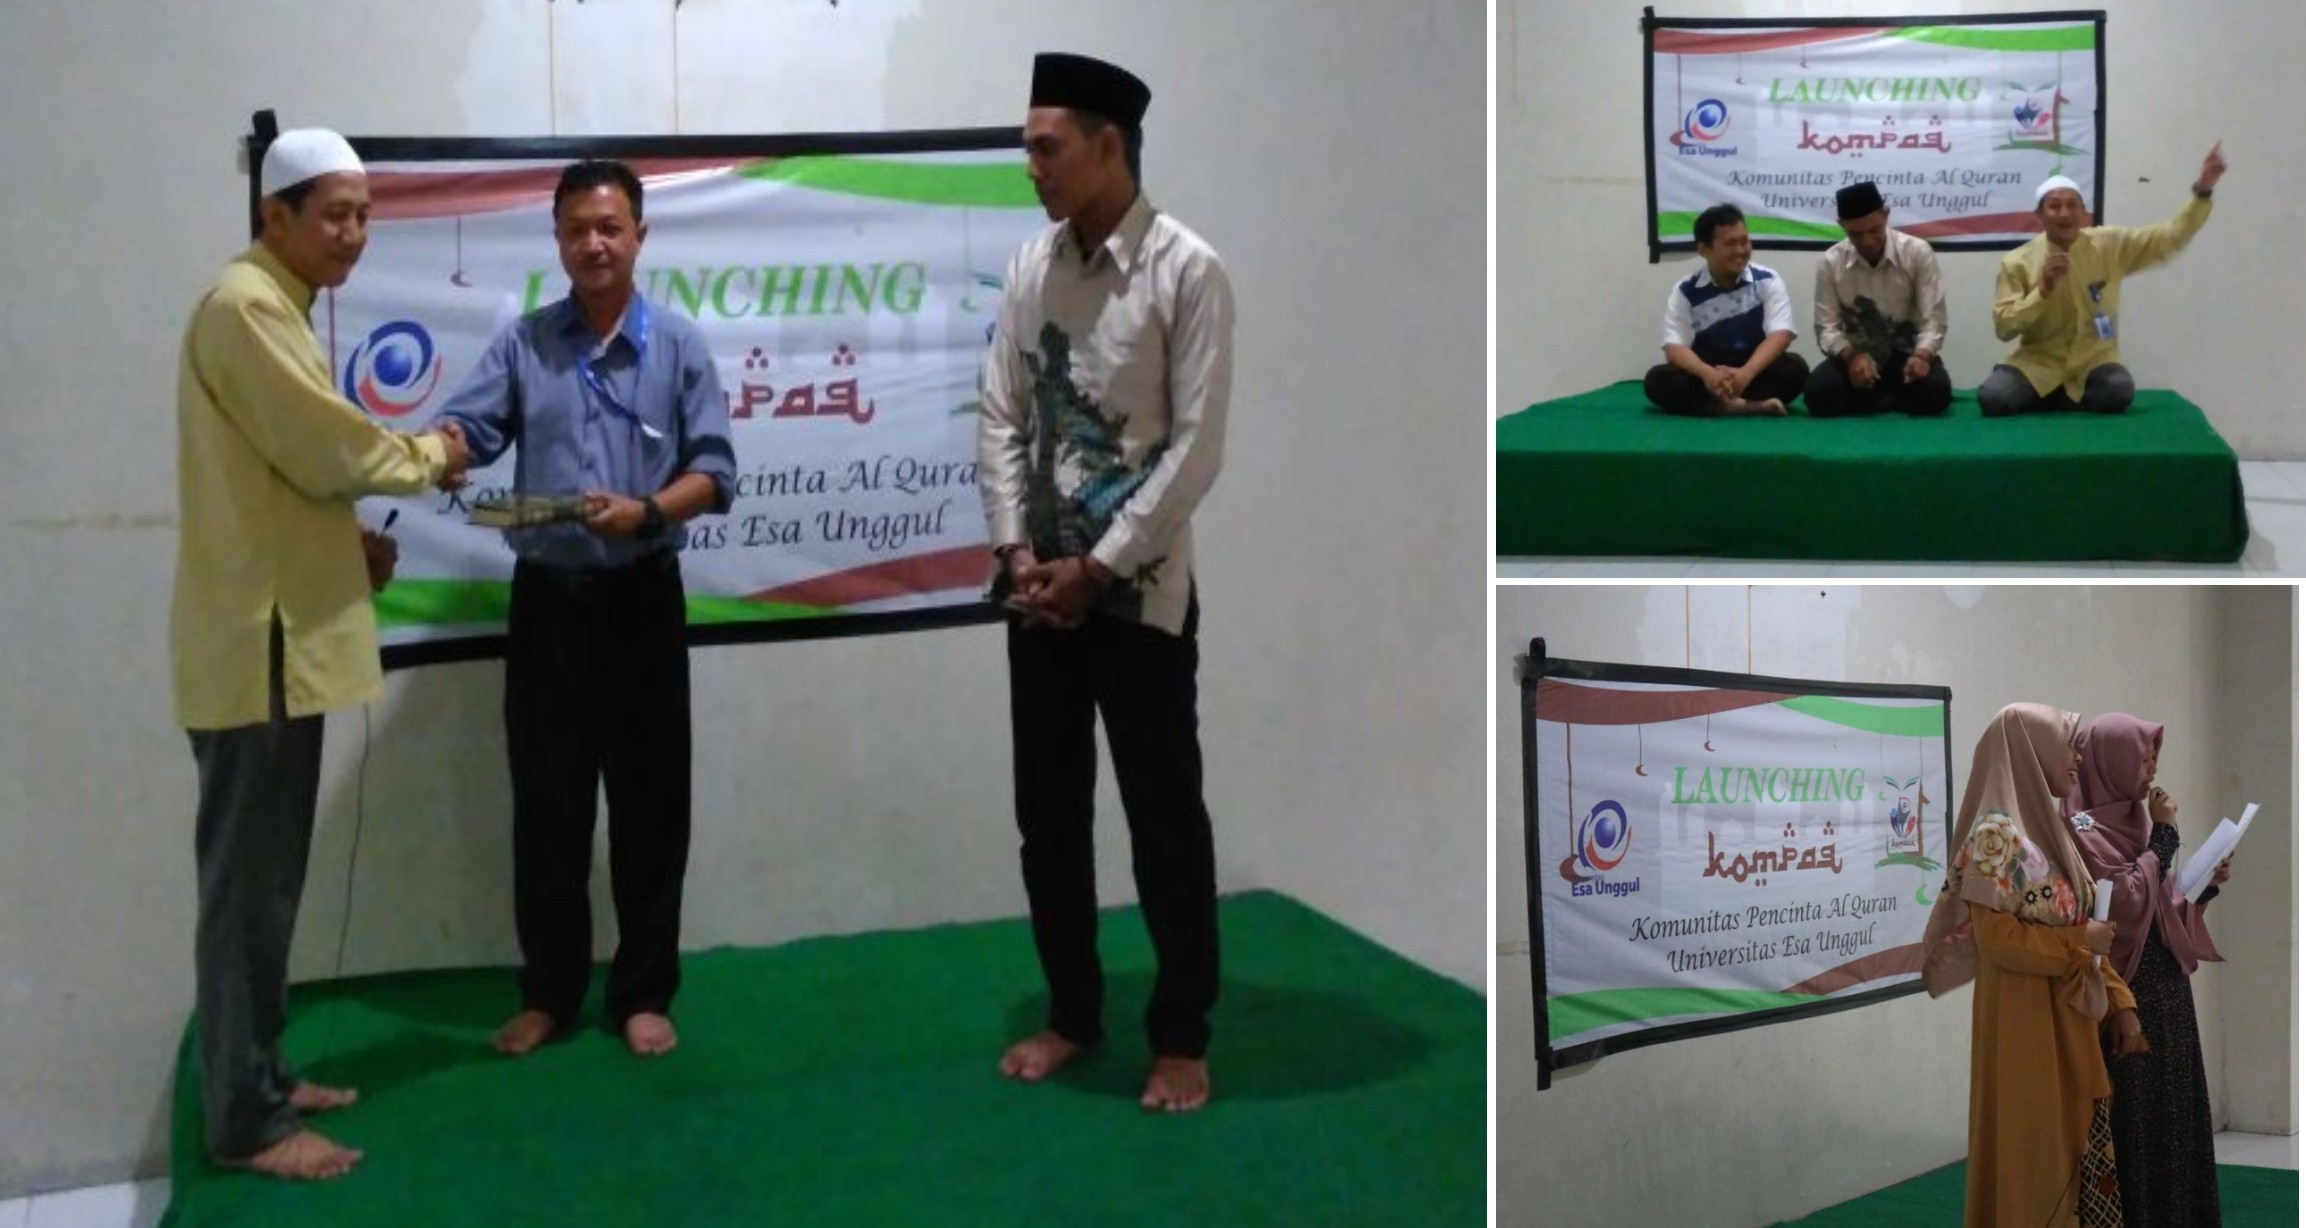 Launching Perdana Komunitas Pecinta Al-qur'an Universitas Esa Unggul